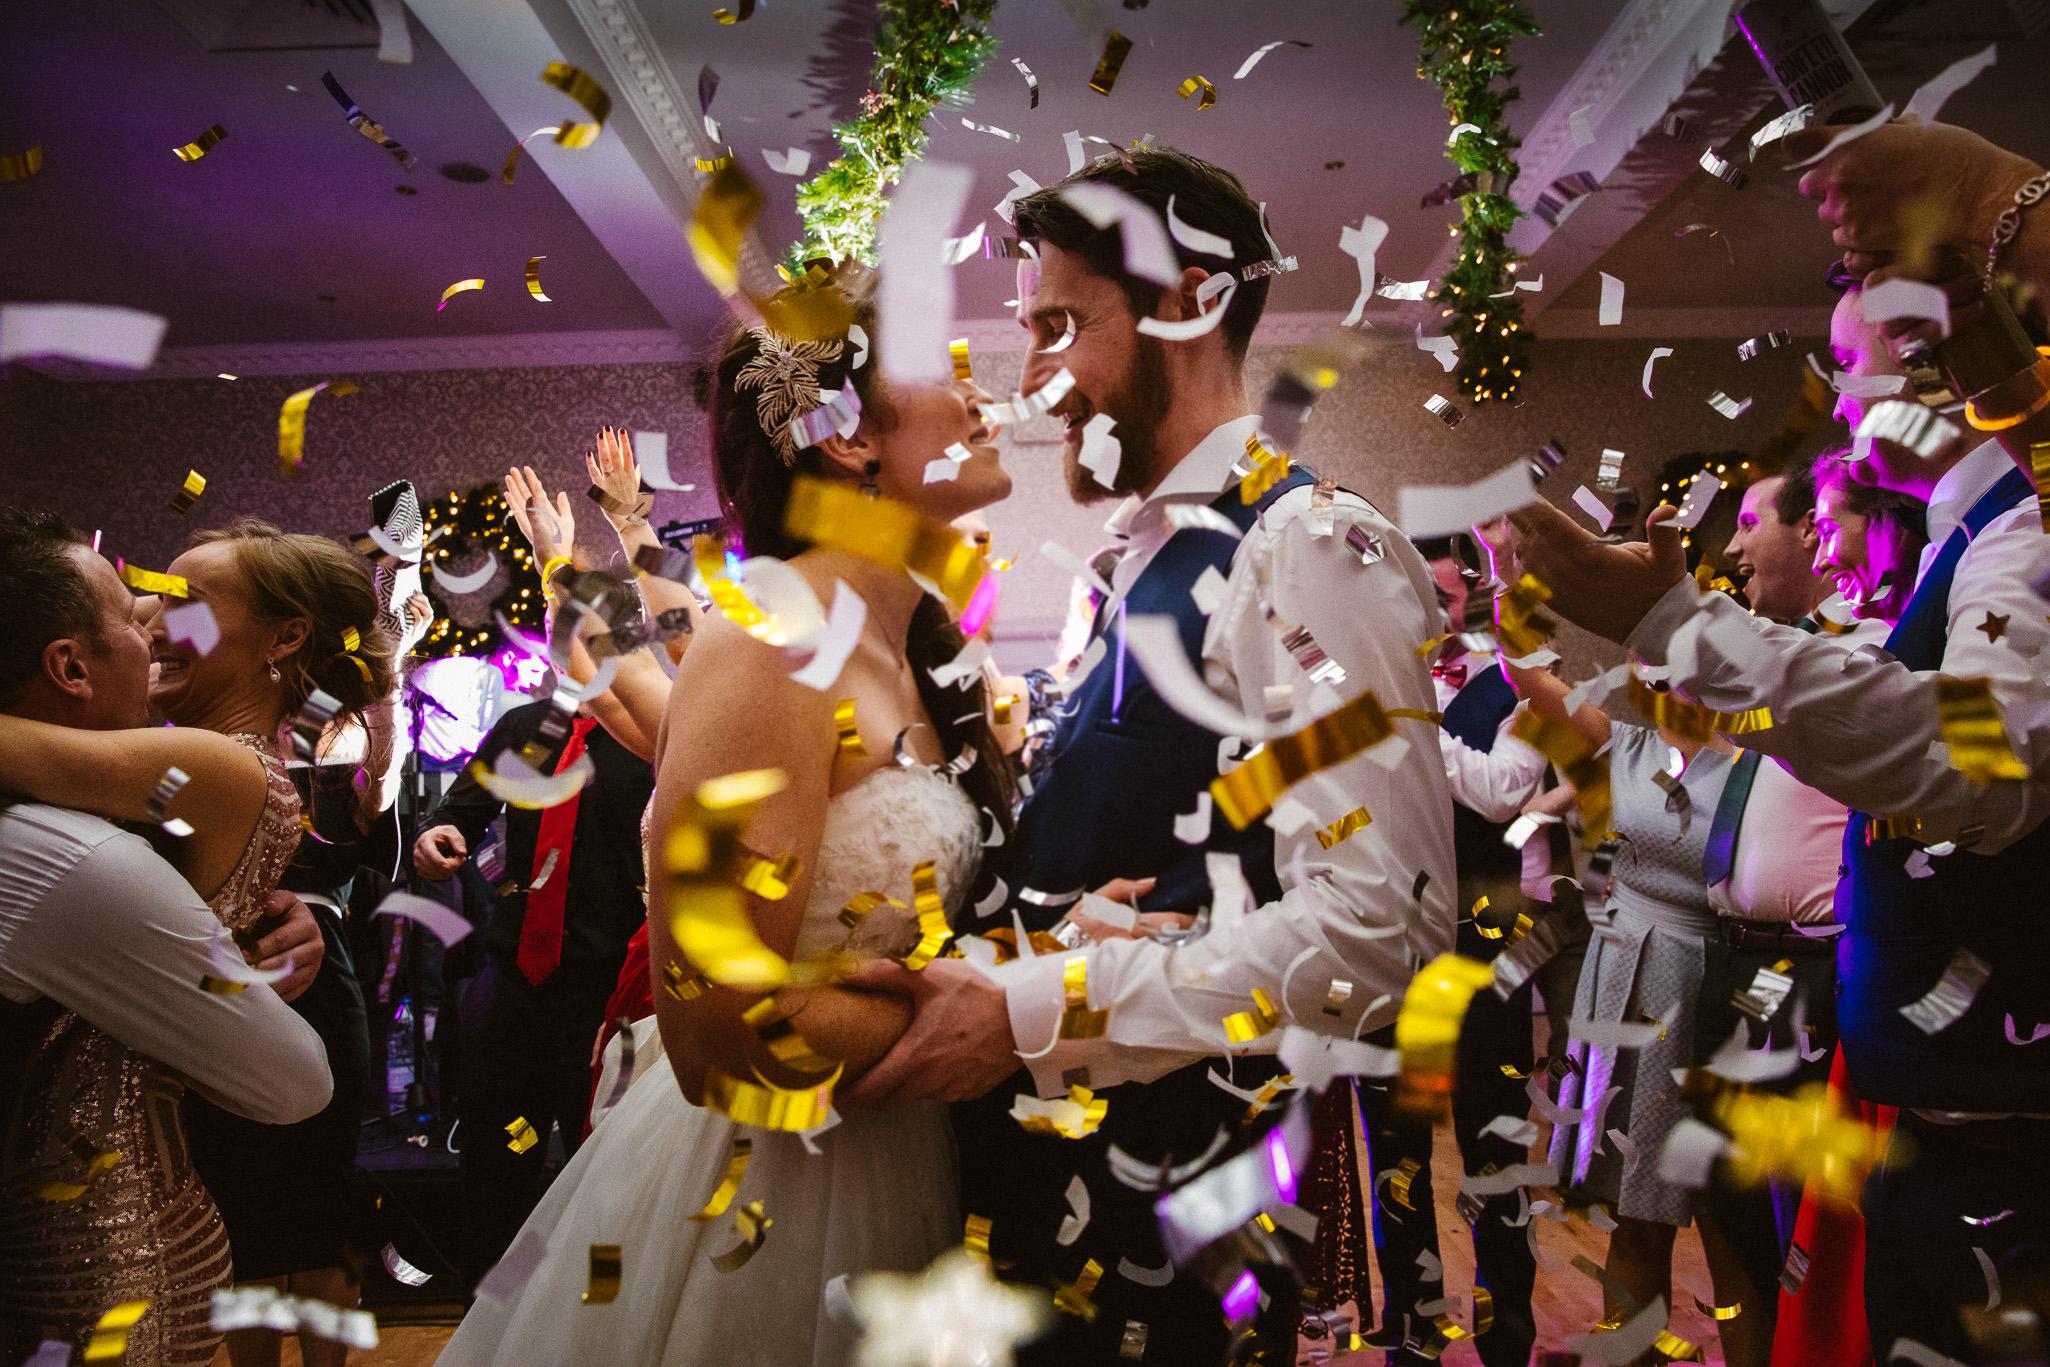 clairebyrnephotography-wedding-night-sparklers-new-years-eve-denyce-leonard-30.jpg